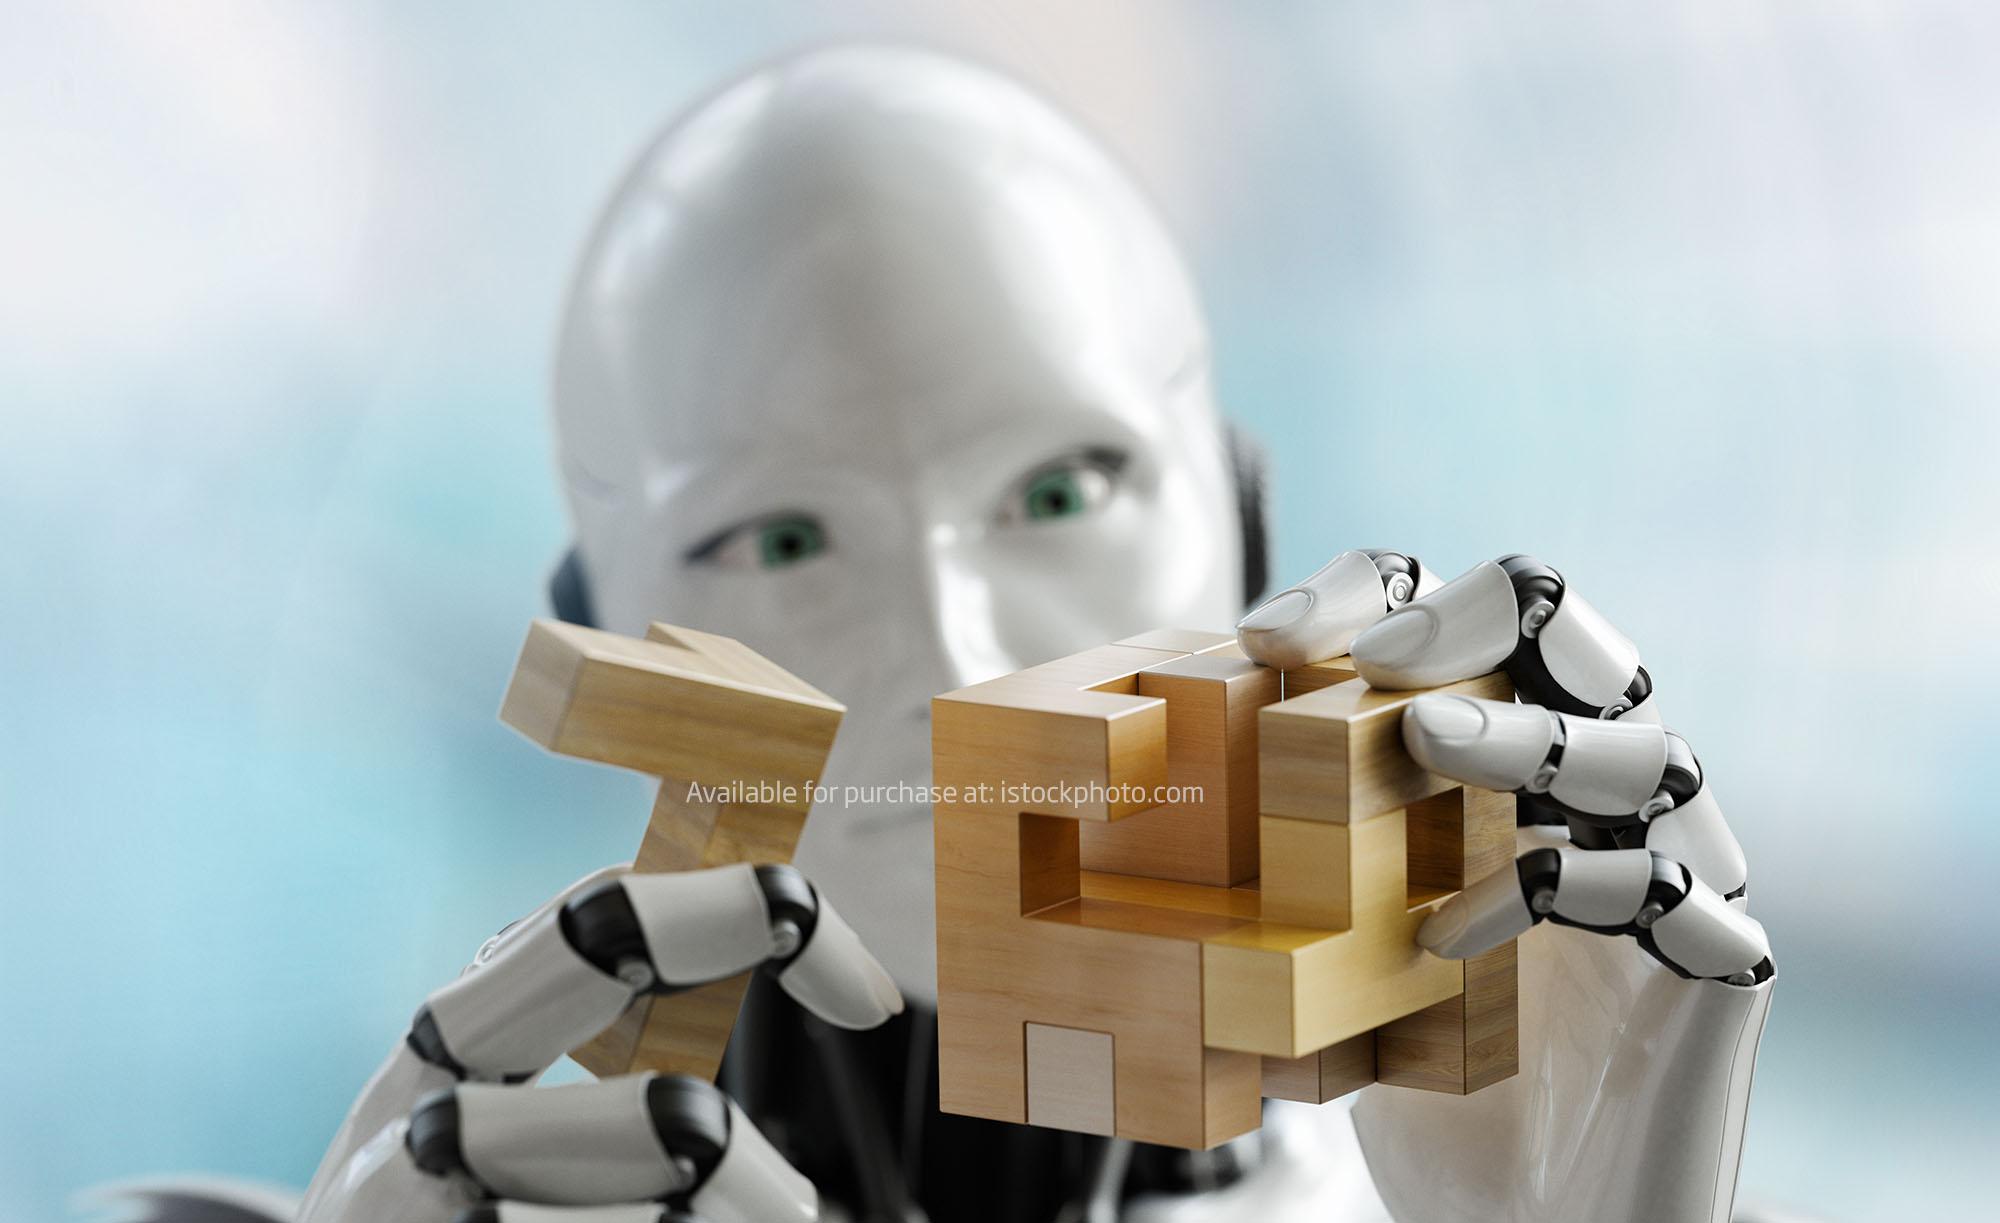 robot_woodenpuzzle_Close_OOF